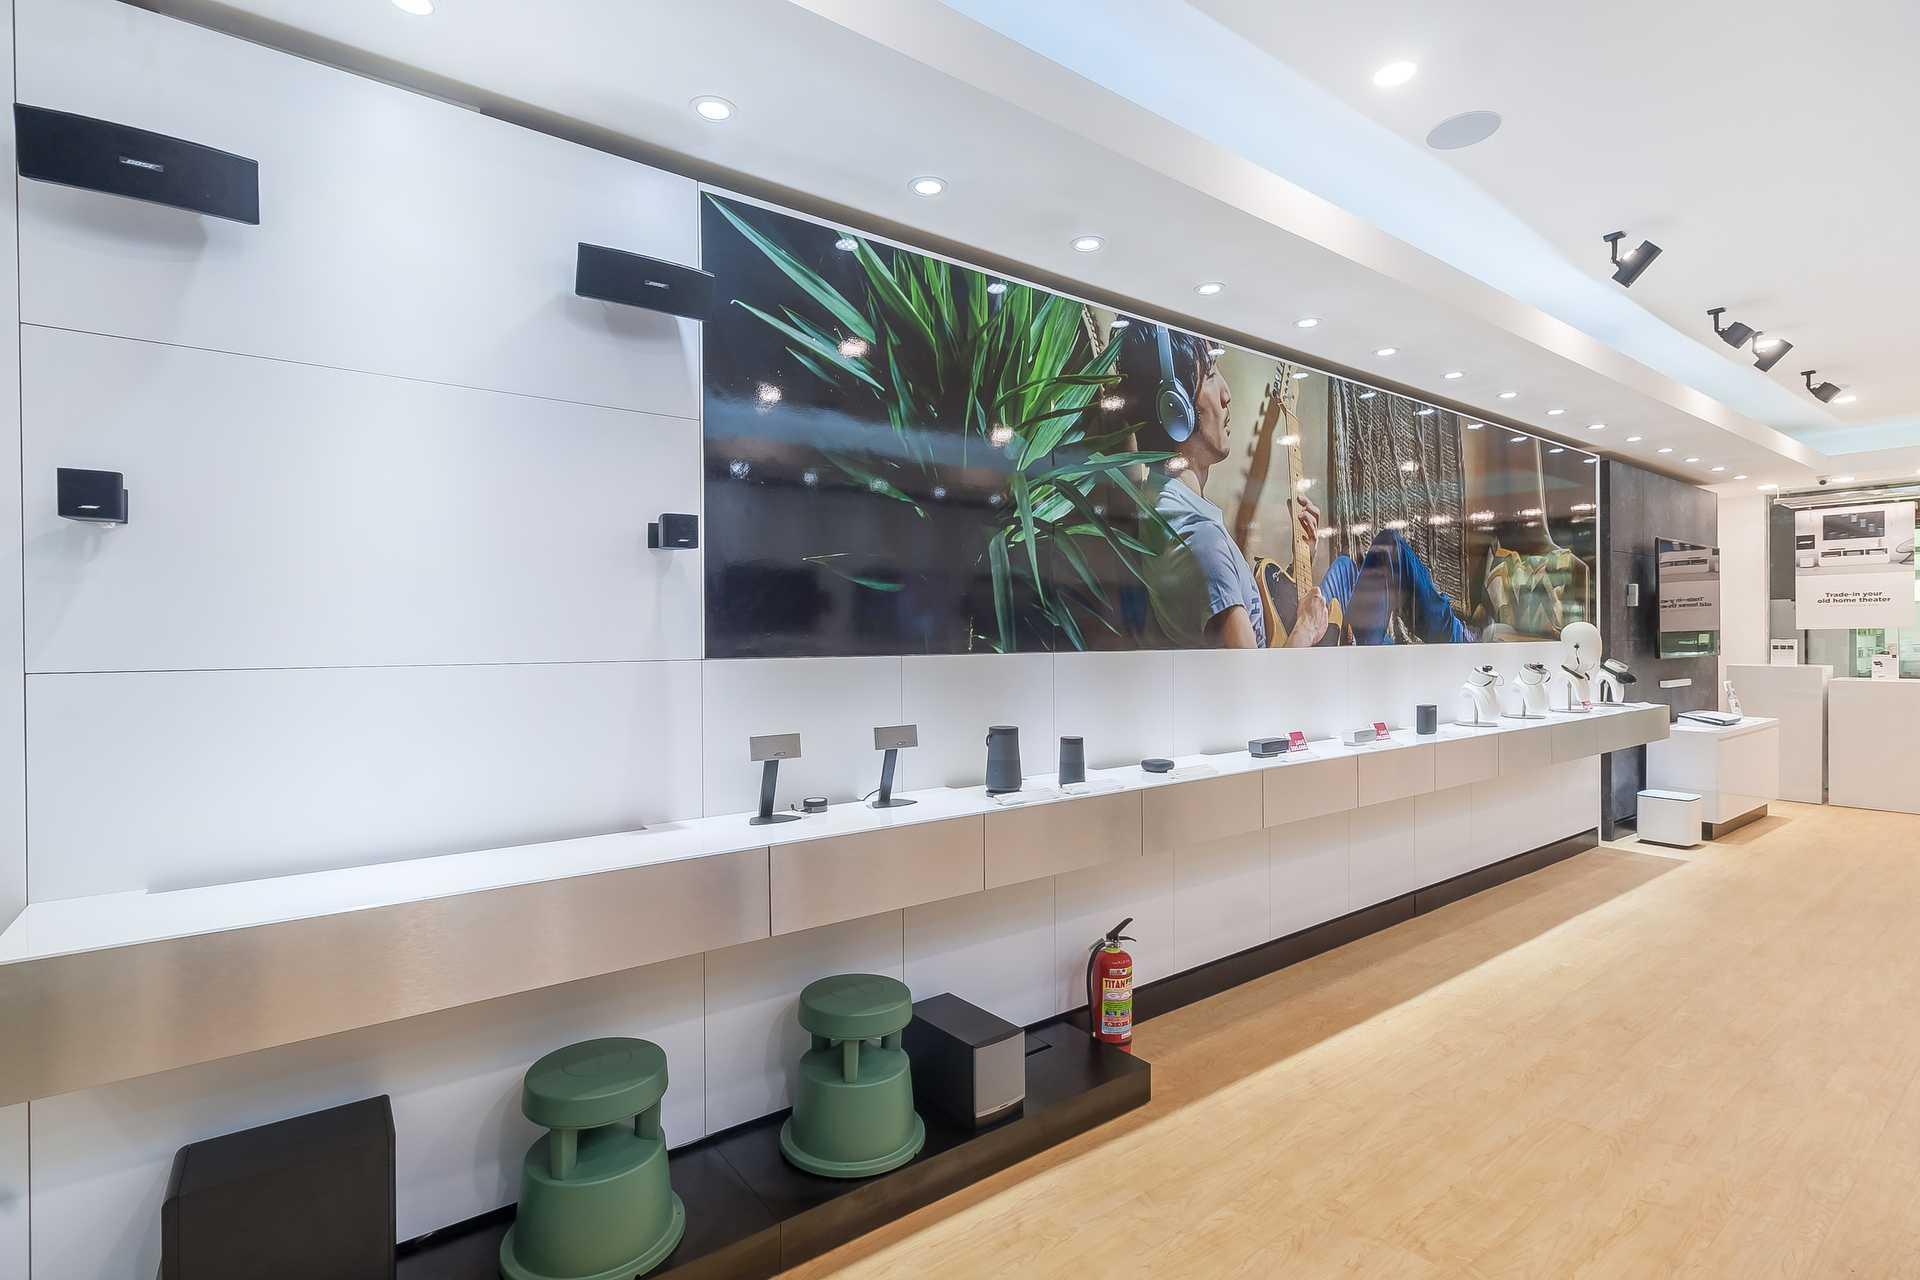 Asakiwari Bose Store Mall Bali Galeria Jl. By Pass Ngurah Rai, Kuta, Kabupaten Badung, Bali 80361, Indonesia Jl. By Pass Ngurah Rai, Kuta, Kabupaten Badung, Bali 80361, Indonesia Asakiwari-Bose-Store-Mall-Bali-Galeria  75784